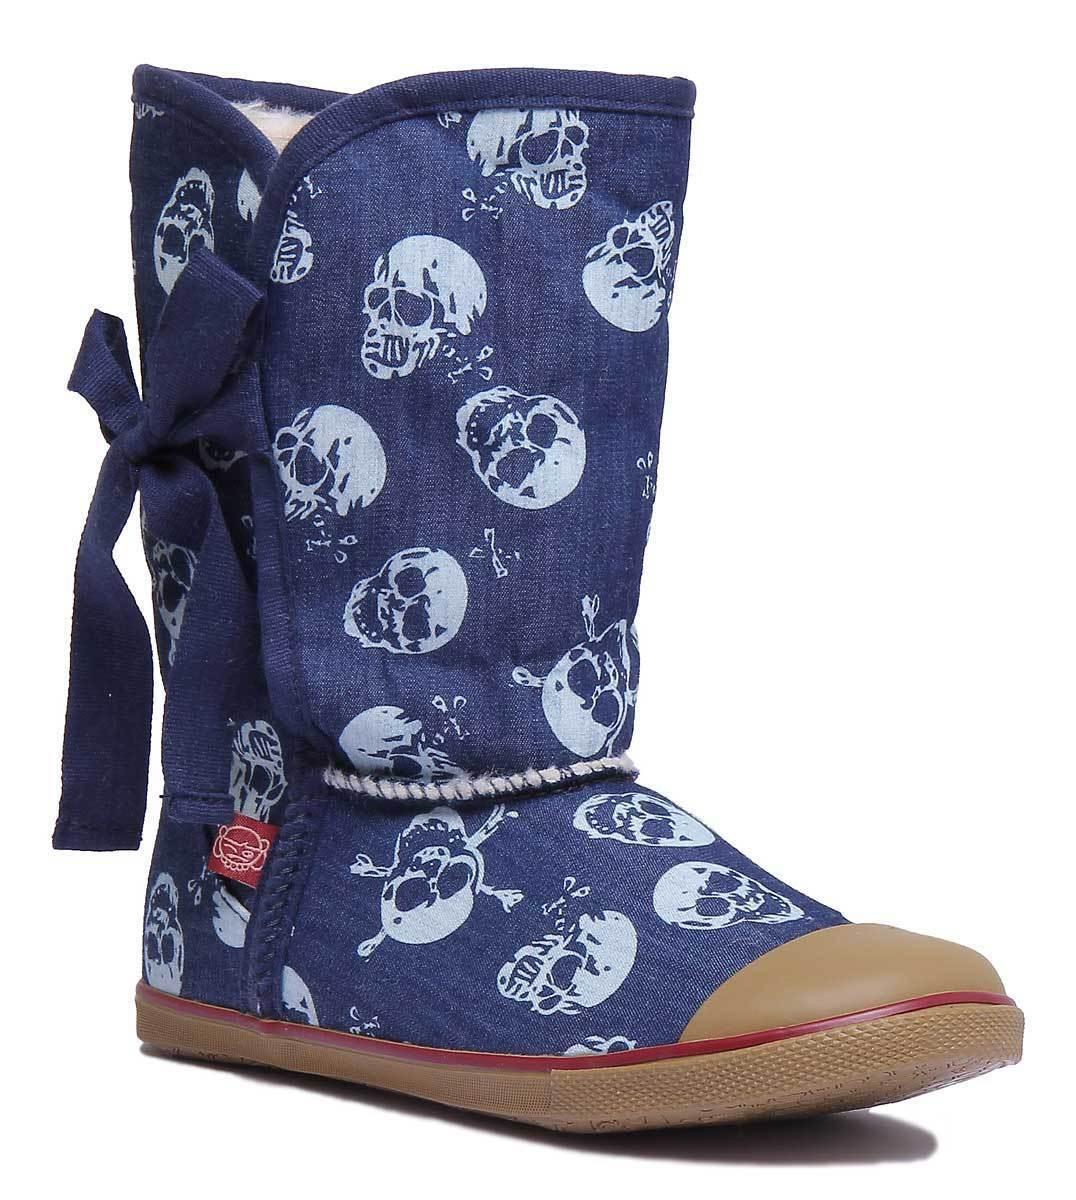 SUGAR ORIGAMI scarpe ORIGAMI SUGAR Tessuto Denim Teschi Donna altri Tessuto ORIGAMI   1a84ba